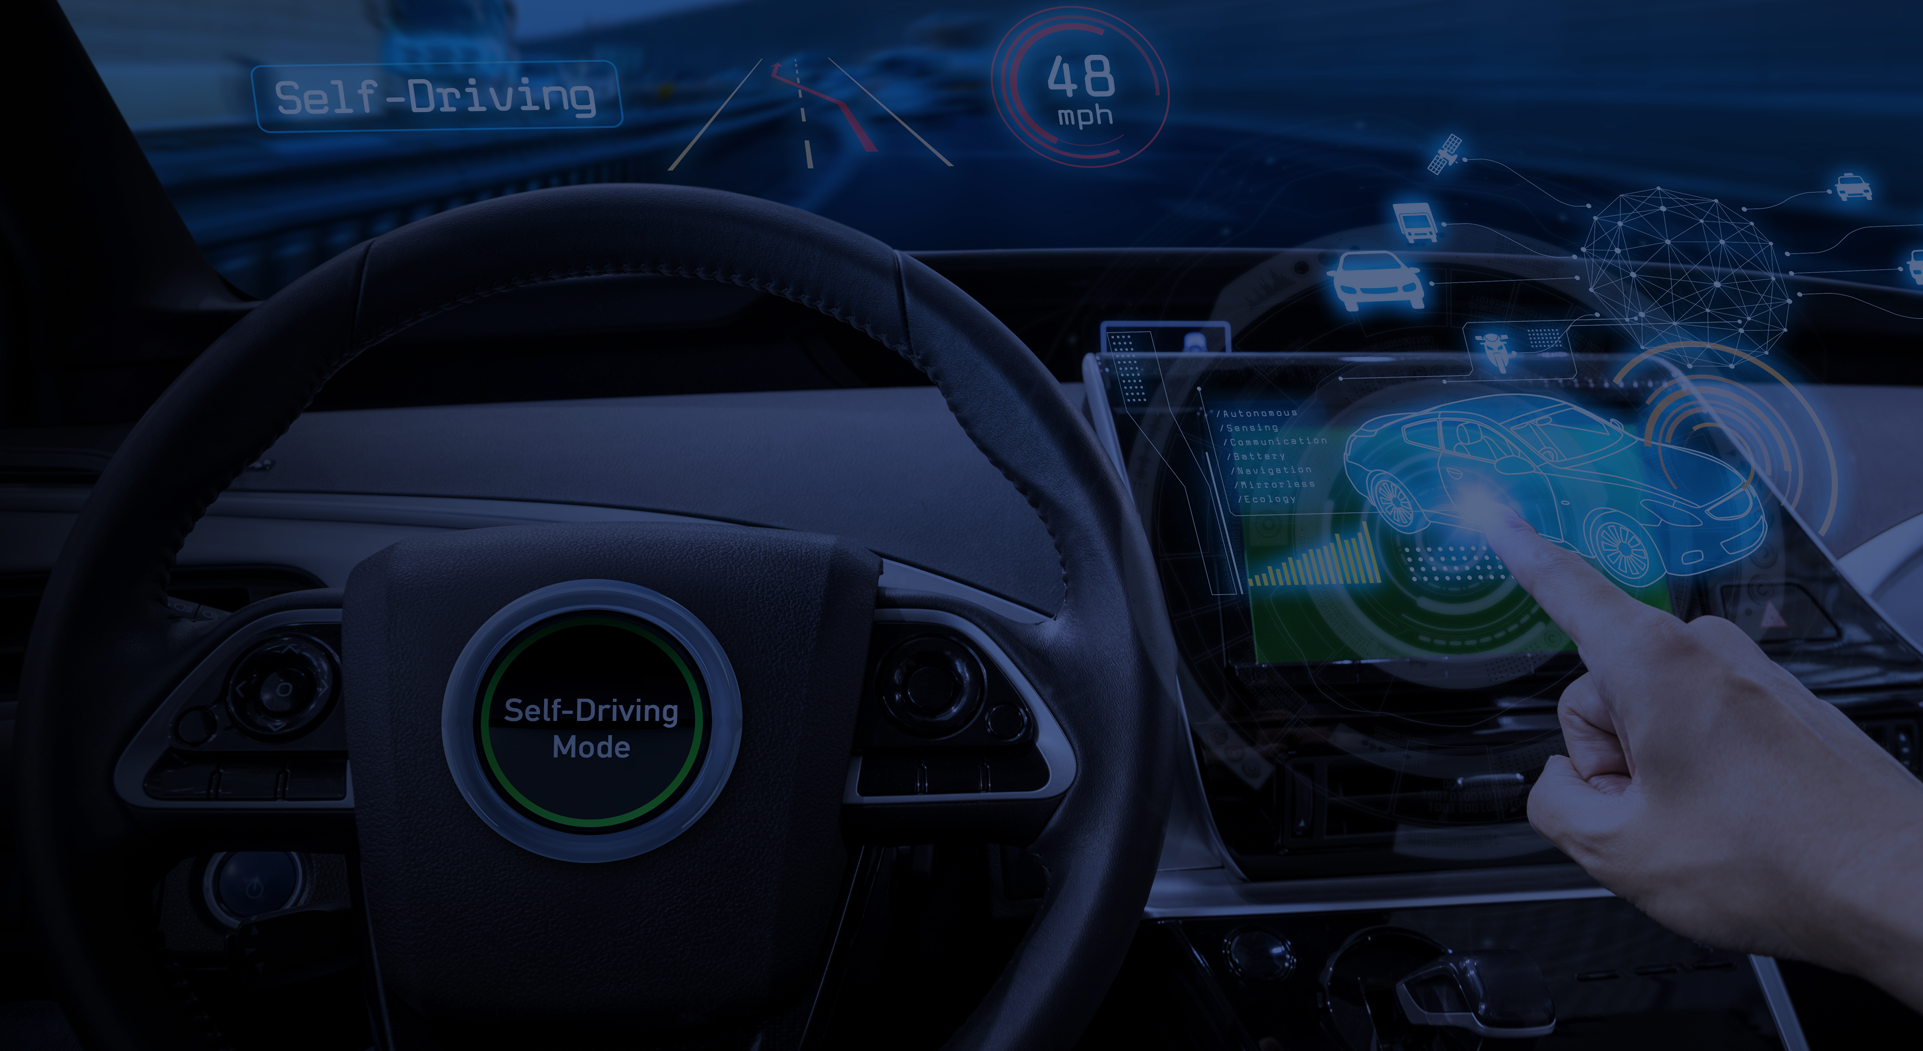 Automotive Design, Test and Simulation Solutions Market – Jan 2020